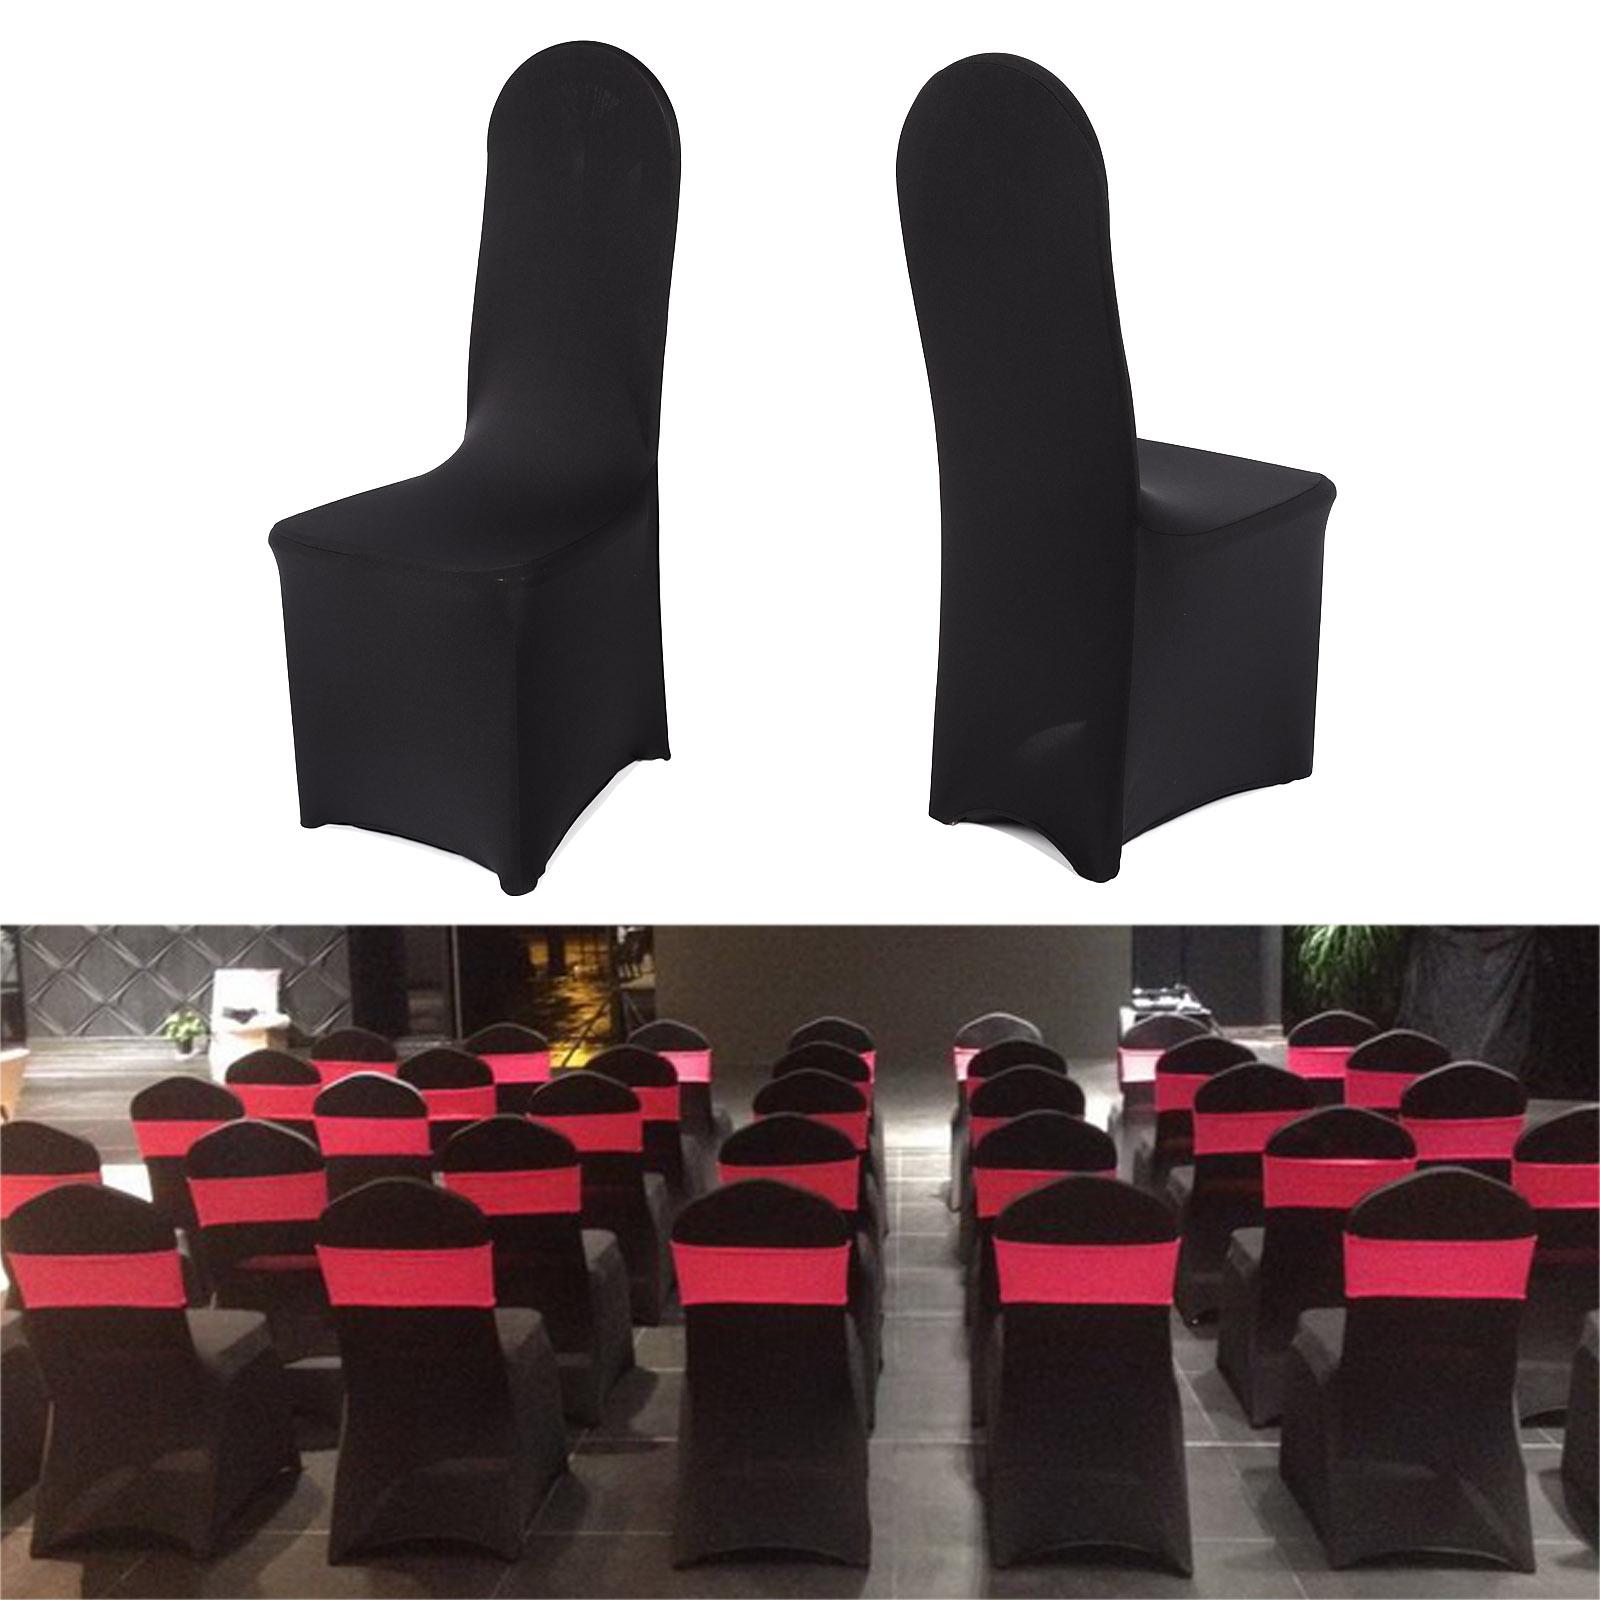 1 100 stuhlhussen universell stuhl berzug stuhlbezug stuhl berwurf schwarz ebay. Black Bedroom Furniture Sets. Home Design Ideas